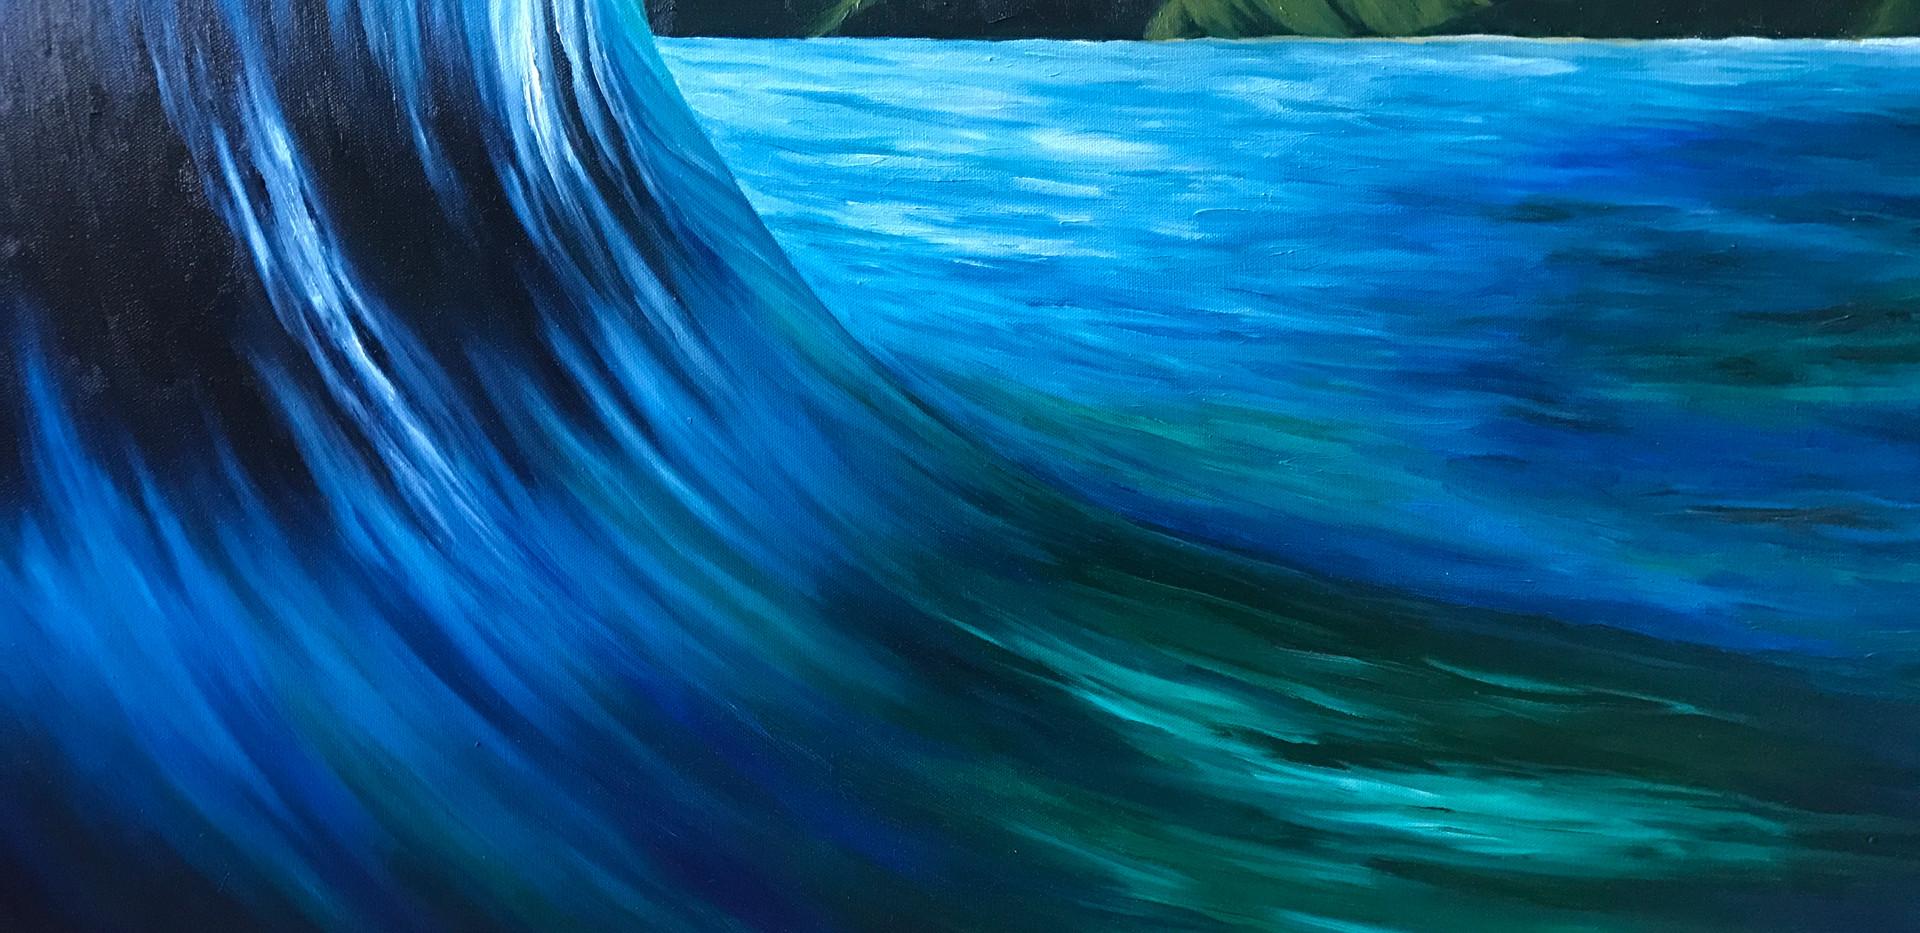 The Big Blue Wave #2